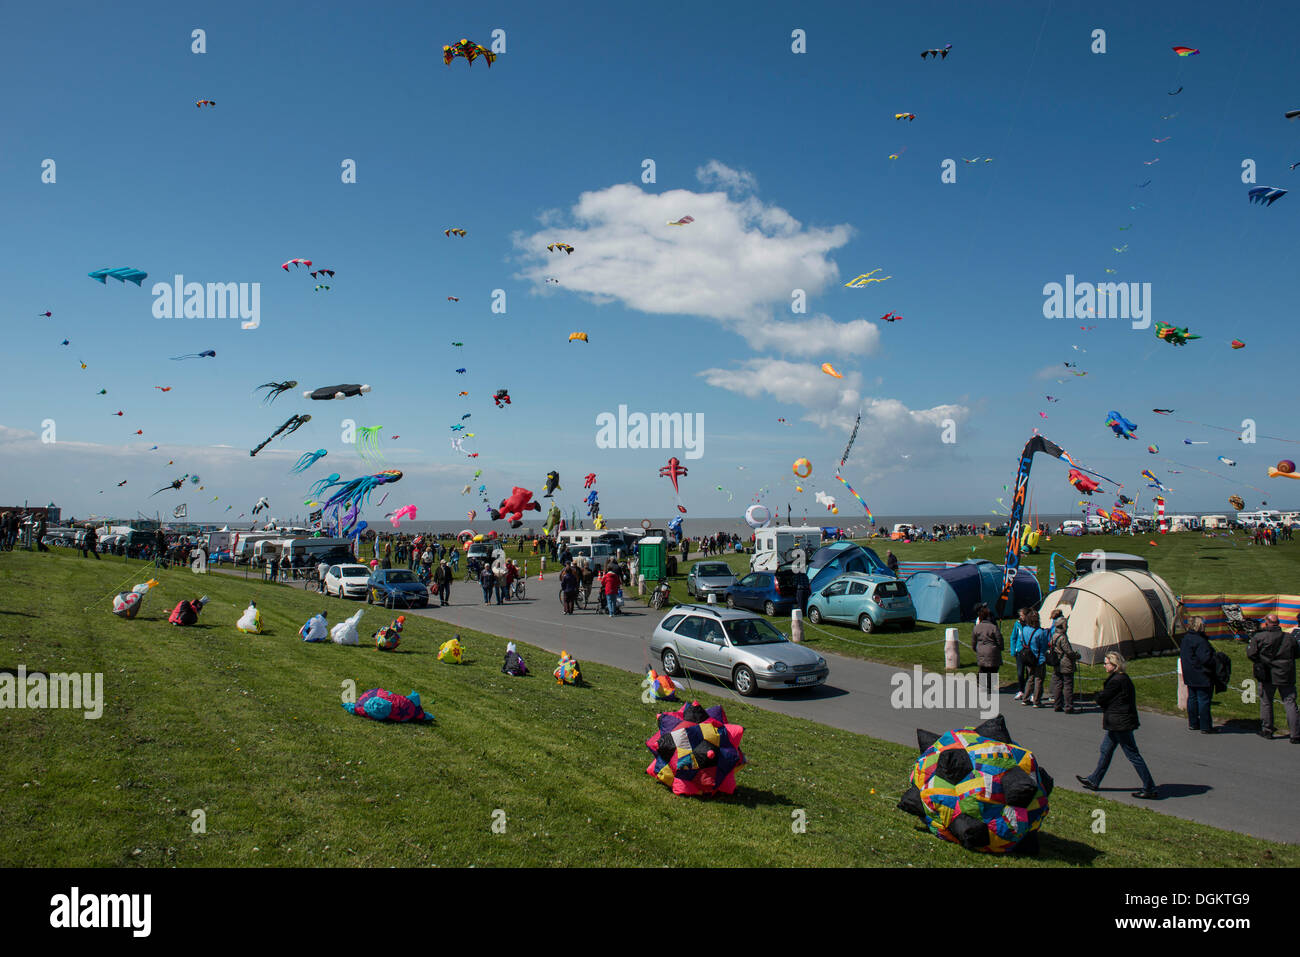 Festival internacional de cometas, Norddeich Drachenfest, Frisia Oriental, Baja Sajonia Imagen De Stock